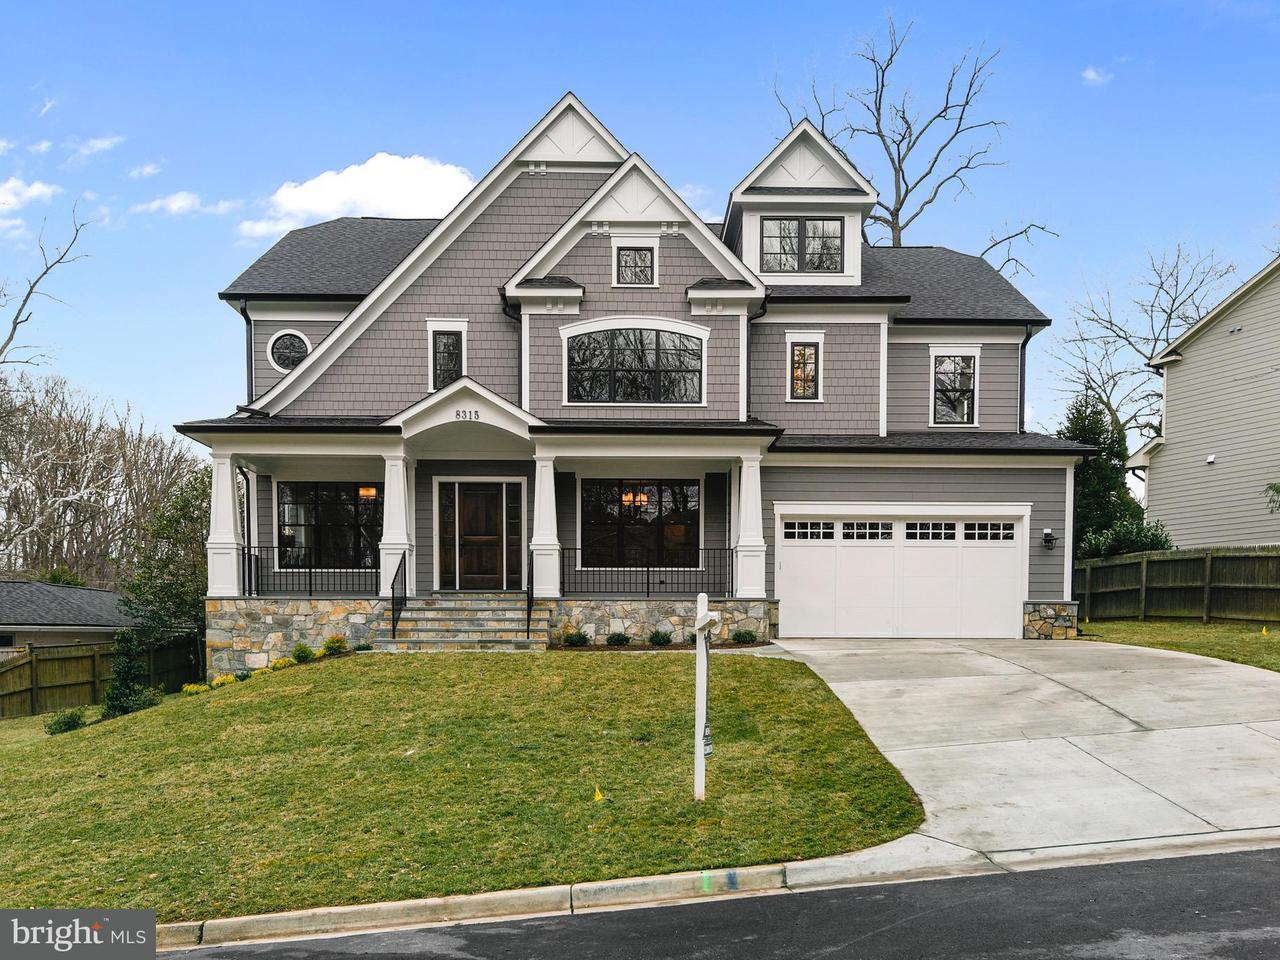 Single Family Home for Sale at 8315 Thoreau Drive 8315 Thoreau Drive Bethesda, Maryland 20817 United States